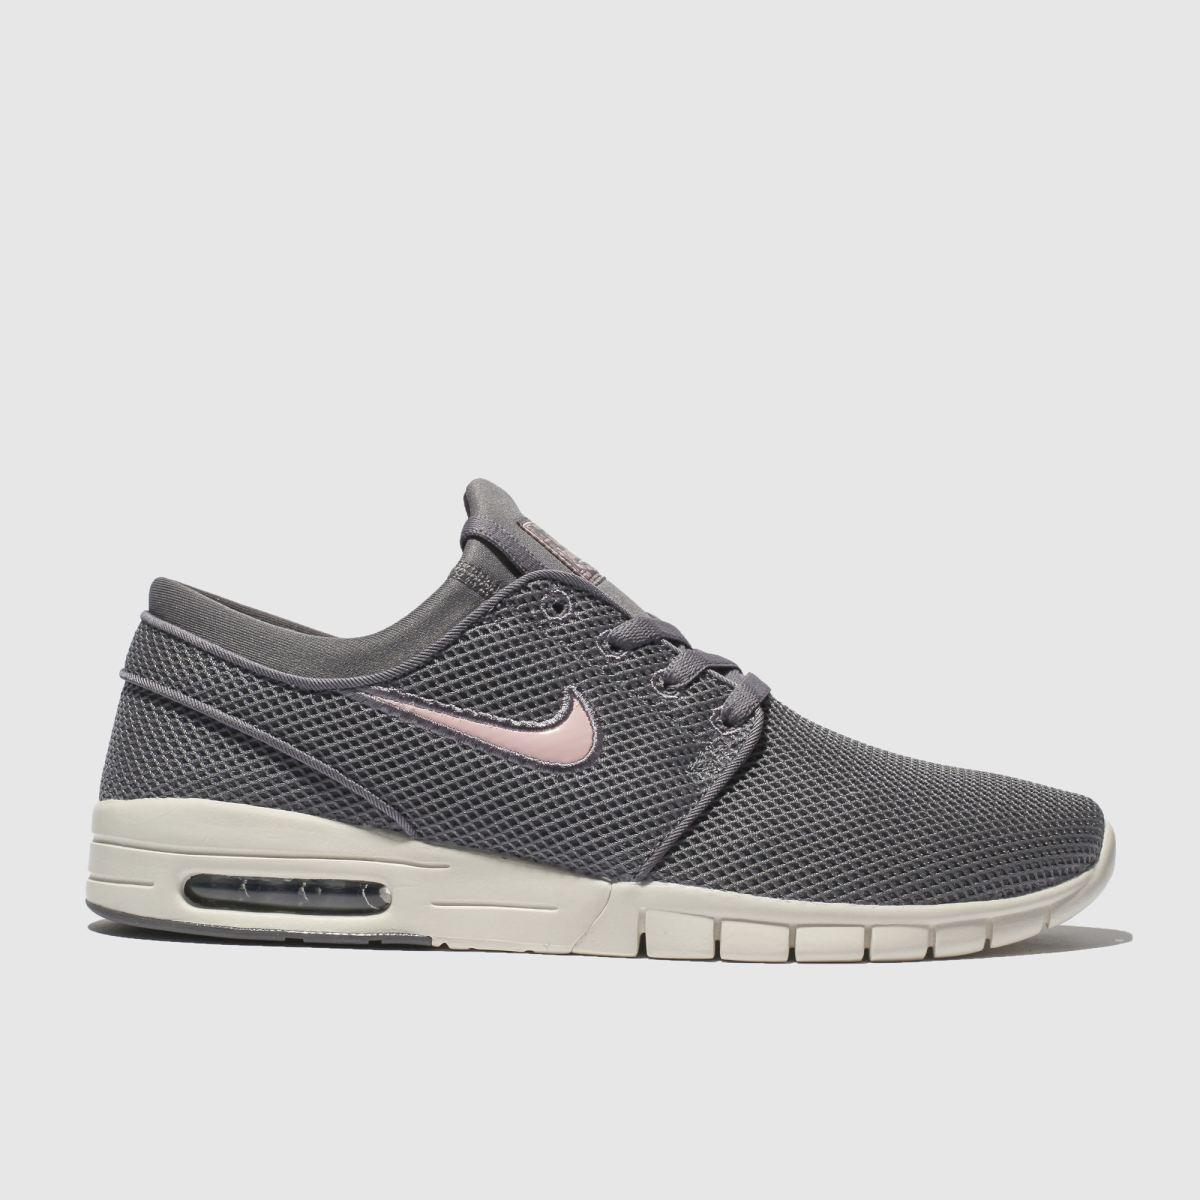 Nike Sb Dark Grey Stefan Janoski Max Trainers